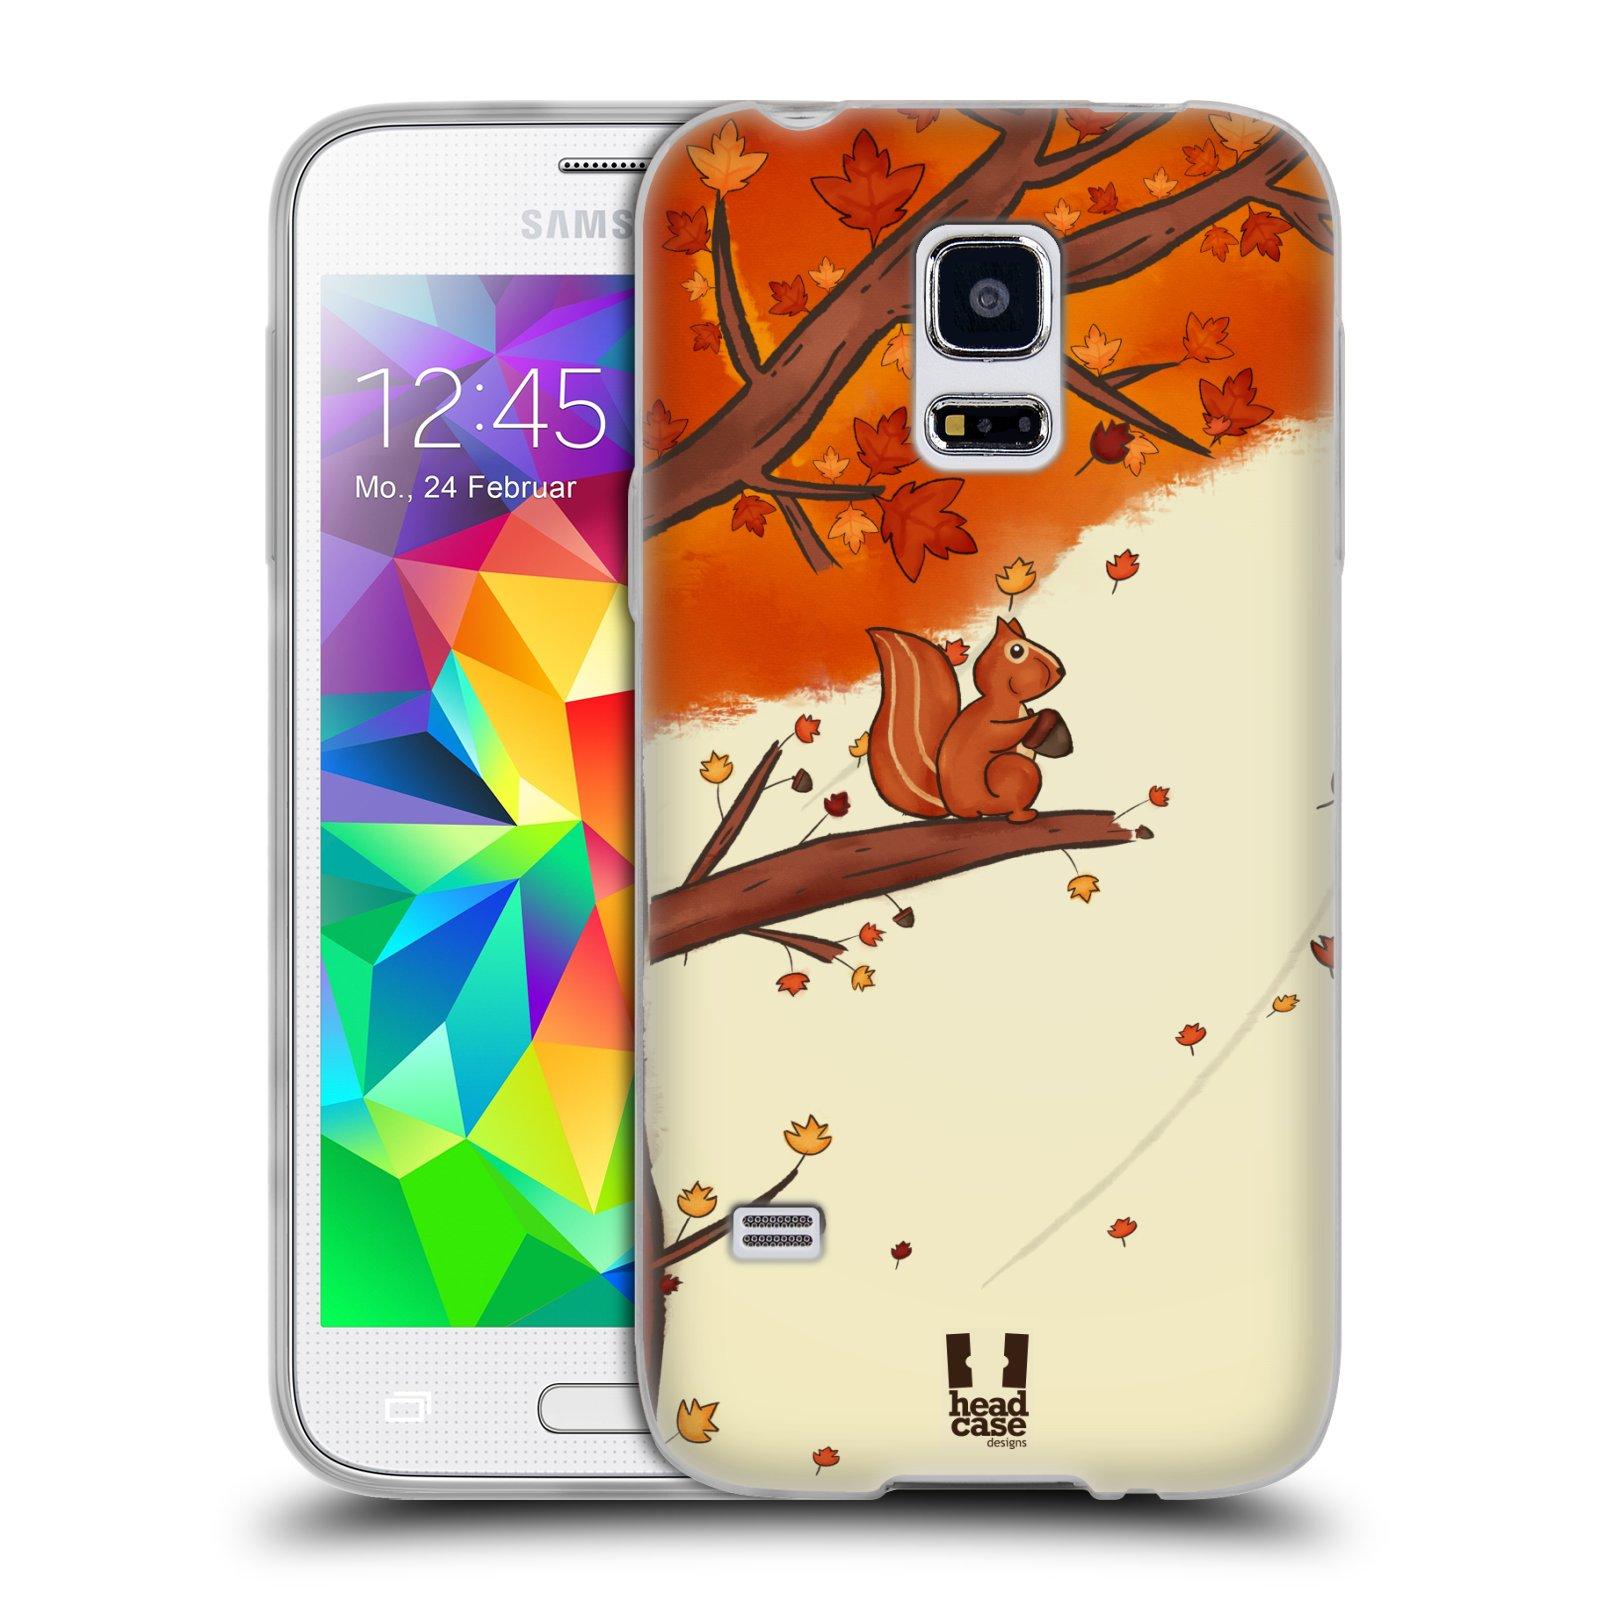 HEAD CASE silikonový obal na mobil Samsung Galaxy S5 MINI vzor podzimní zvířátka veverka